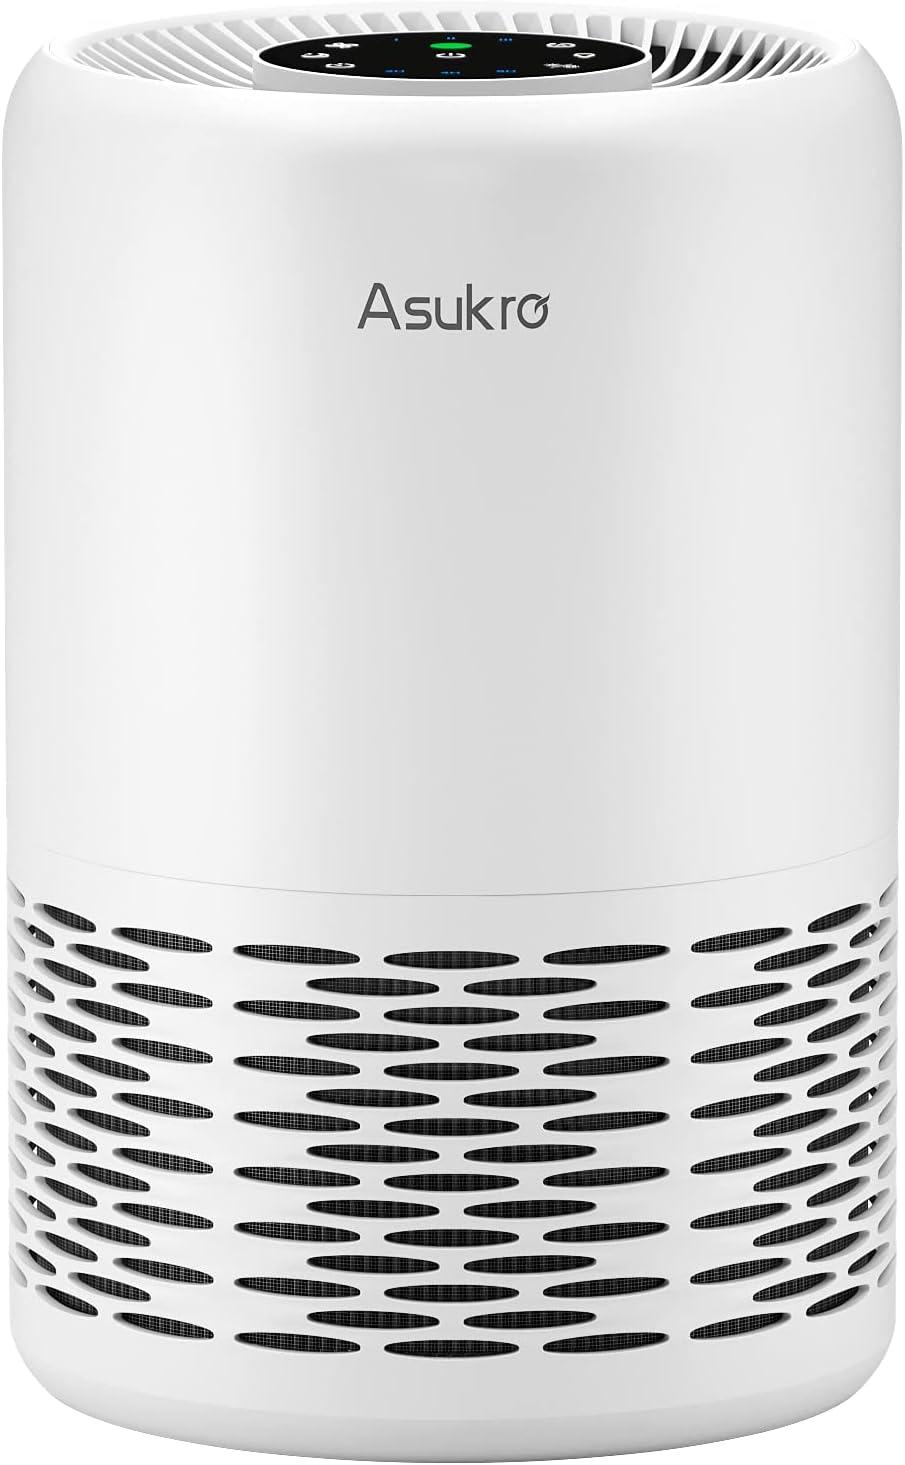 Asukro HEPA Air Purifier for Home Bedroom Allergies, Auto Mode Air Cleaner Filters Dust, Pollen, Smoke, Odors, True H13 Grade